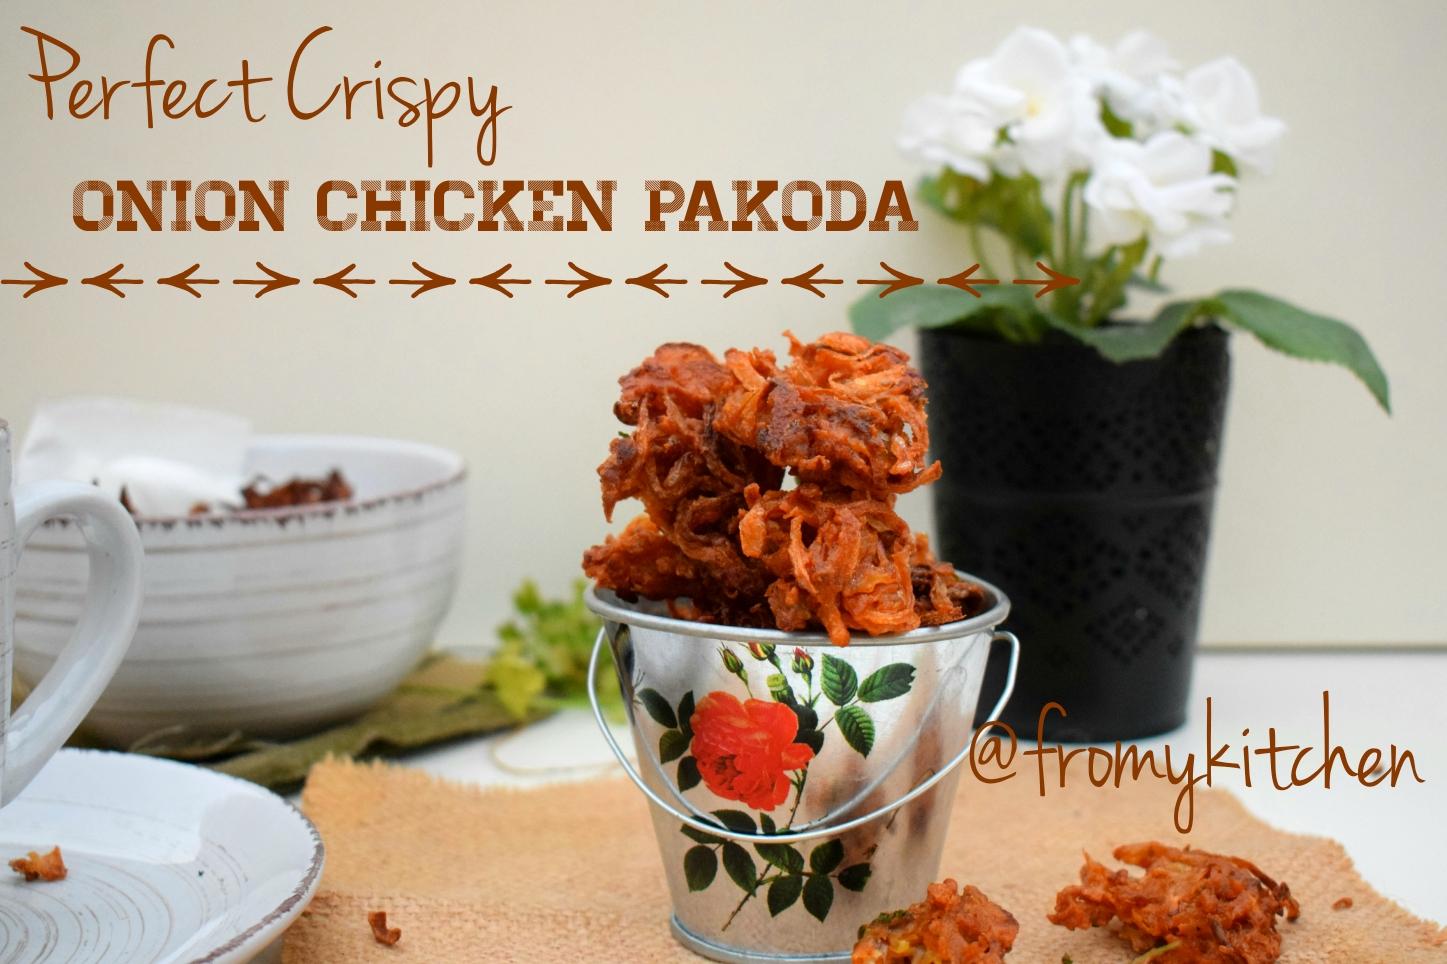 Onion & Chicken Pakoda